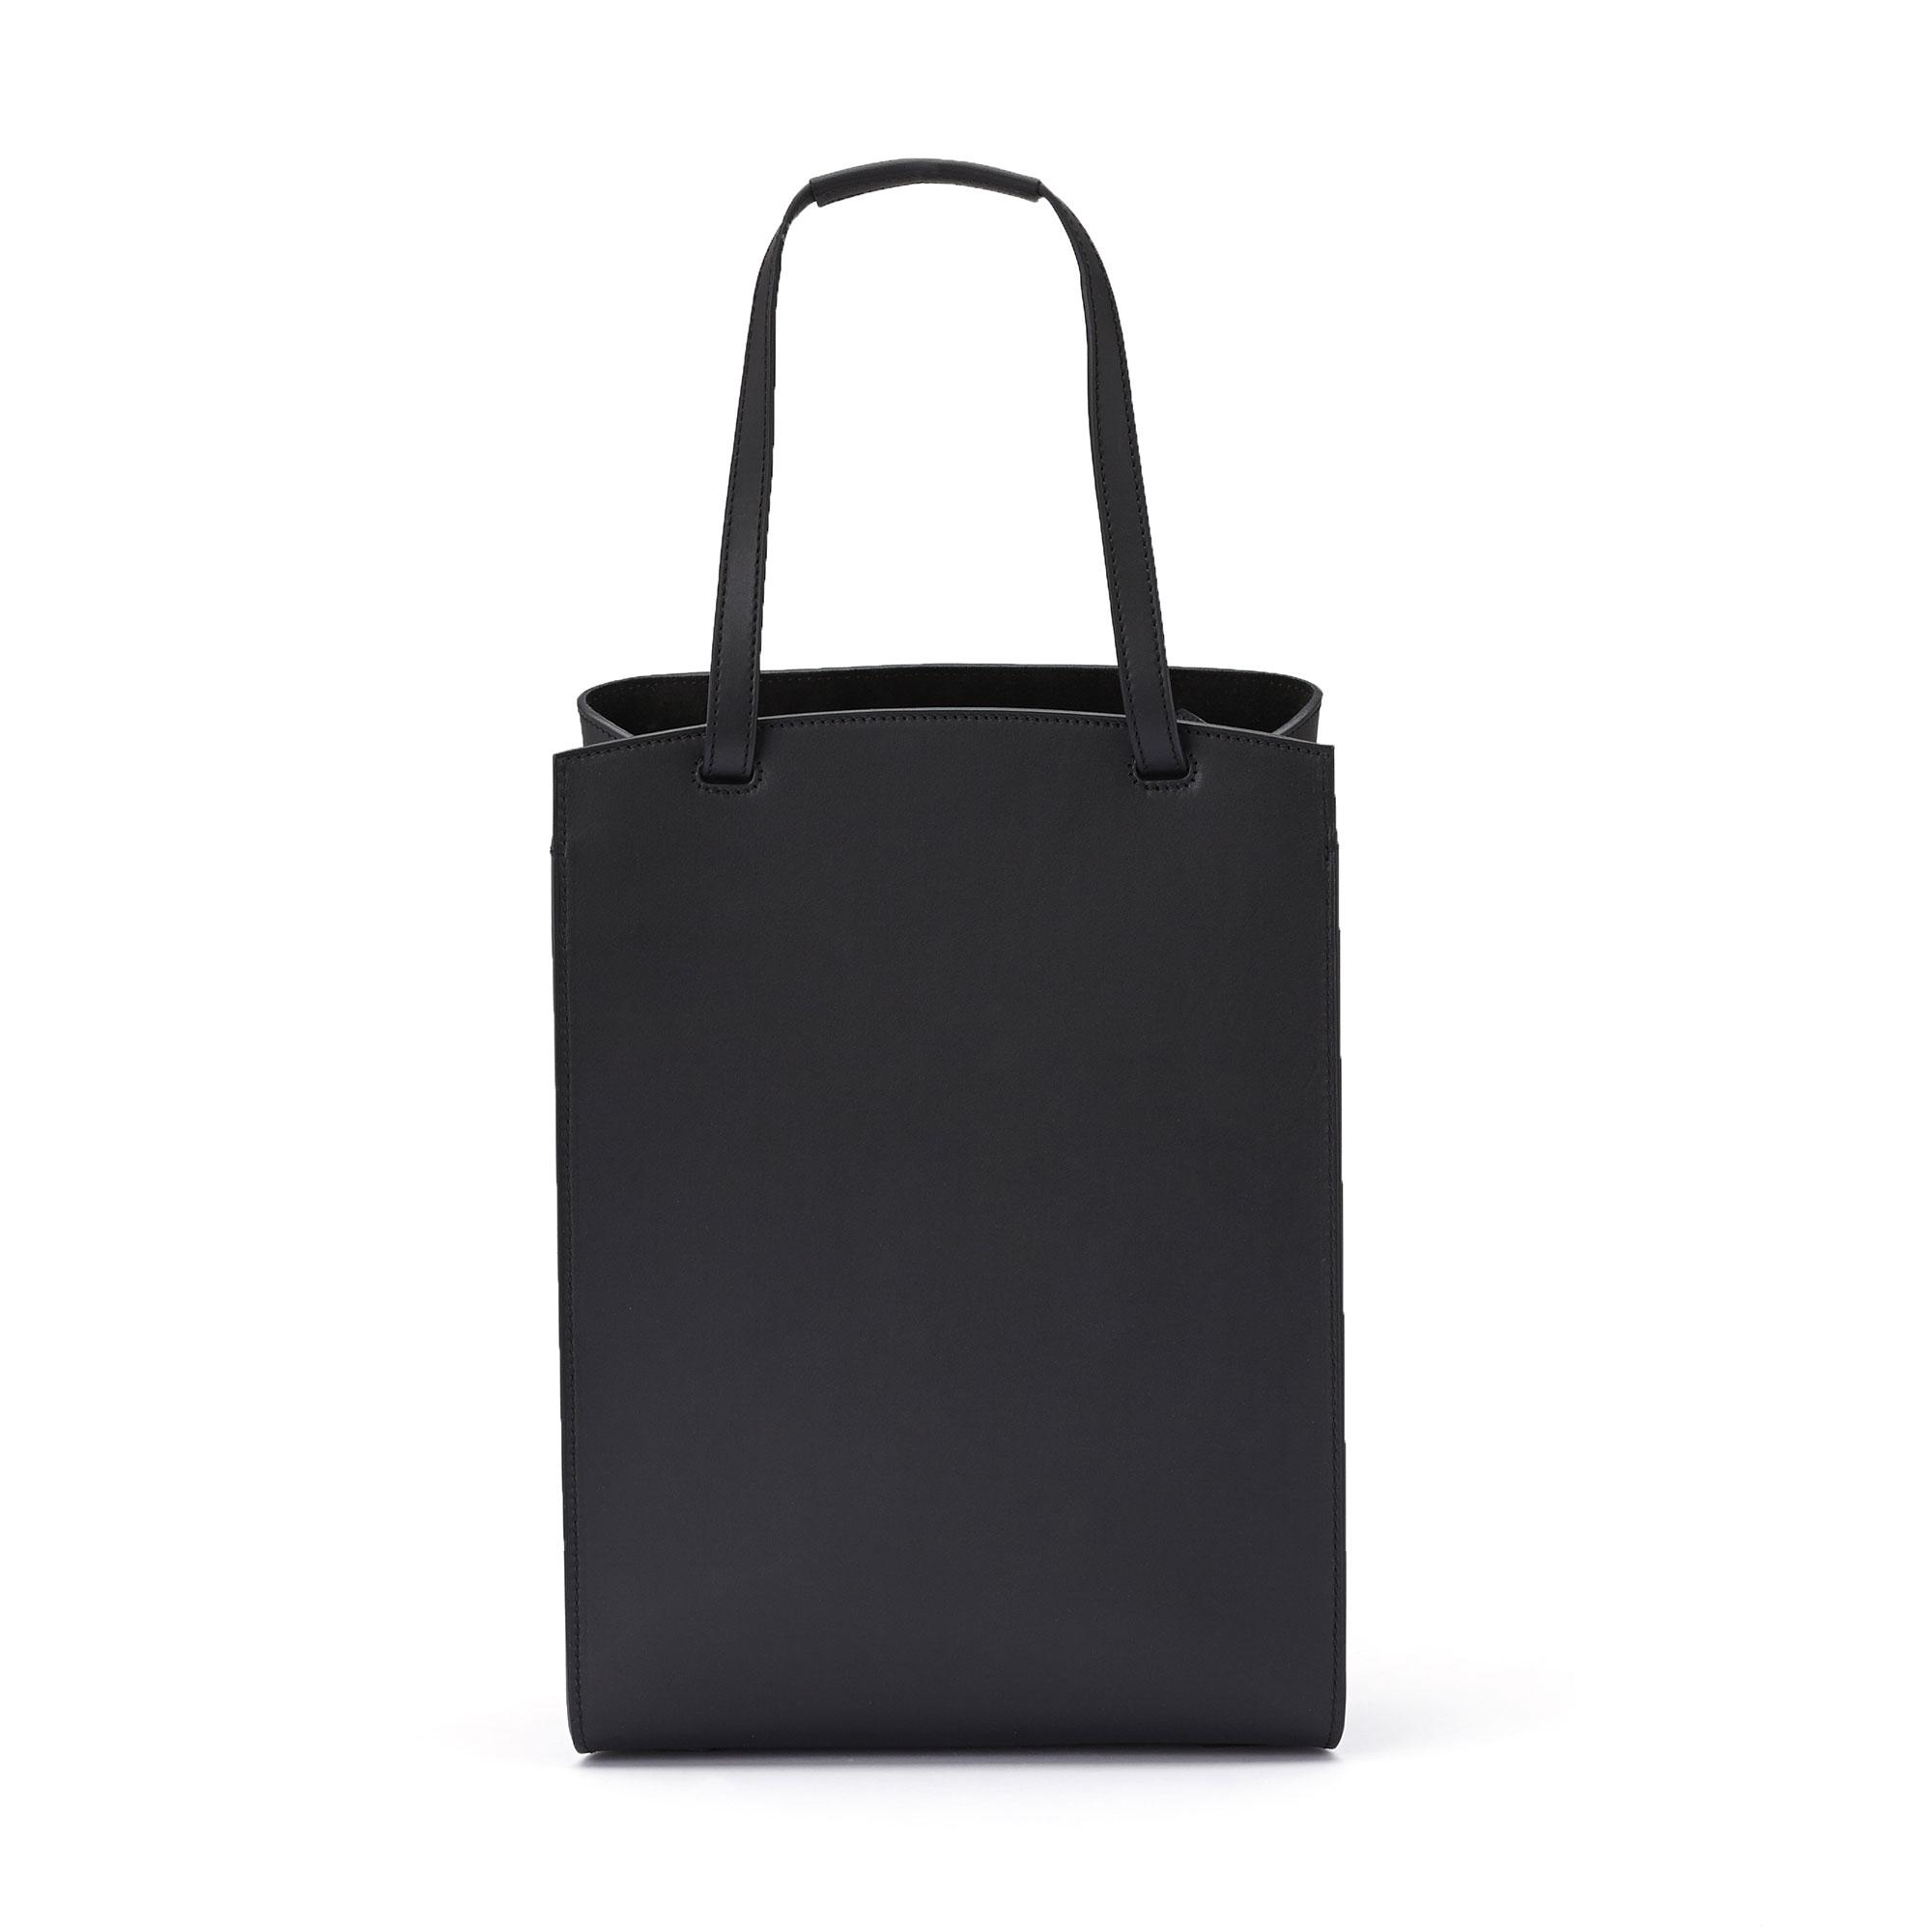 The black french calf, wood leather Arizona bucket bag by Bertoni 1949 04